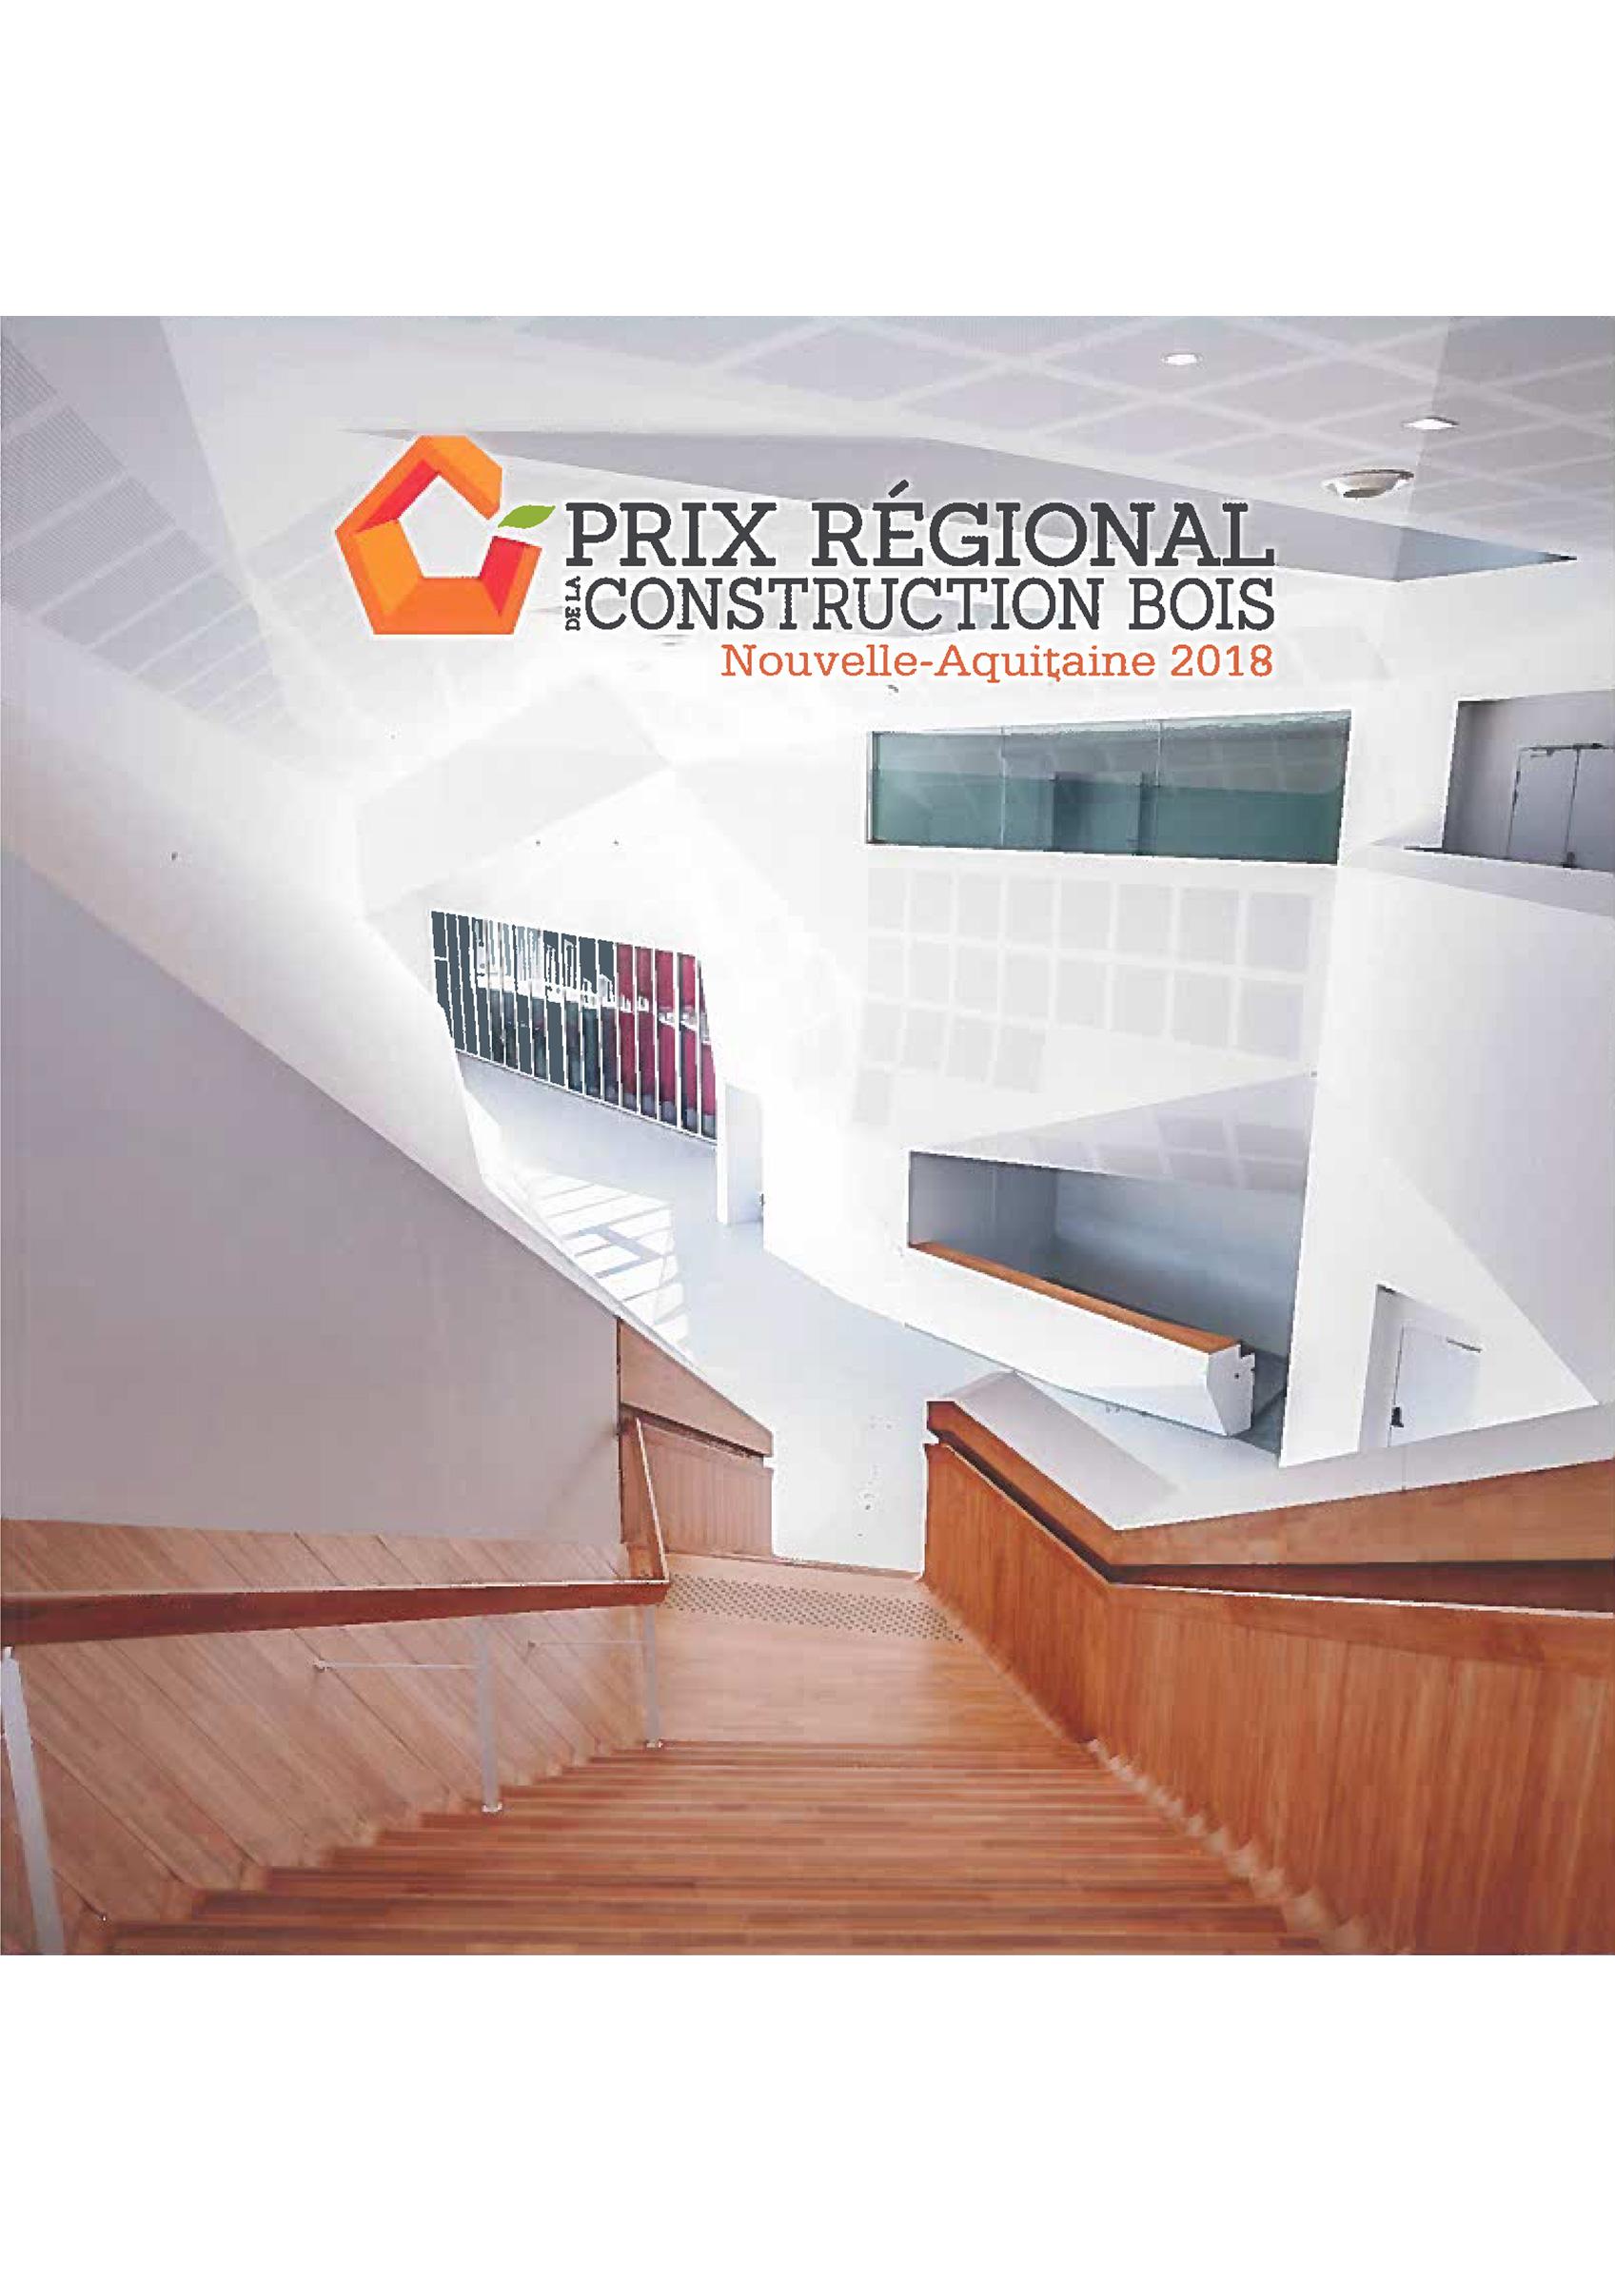 2018-00-PRConstructionBois-publicationSimple-alterlab.jpg